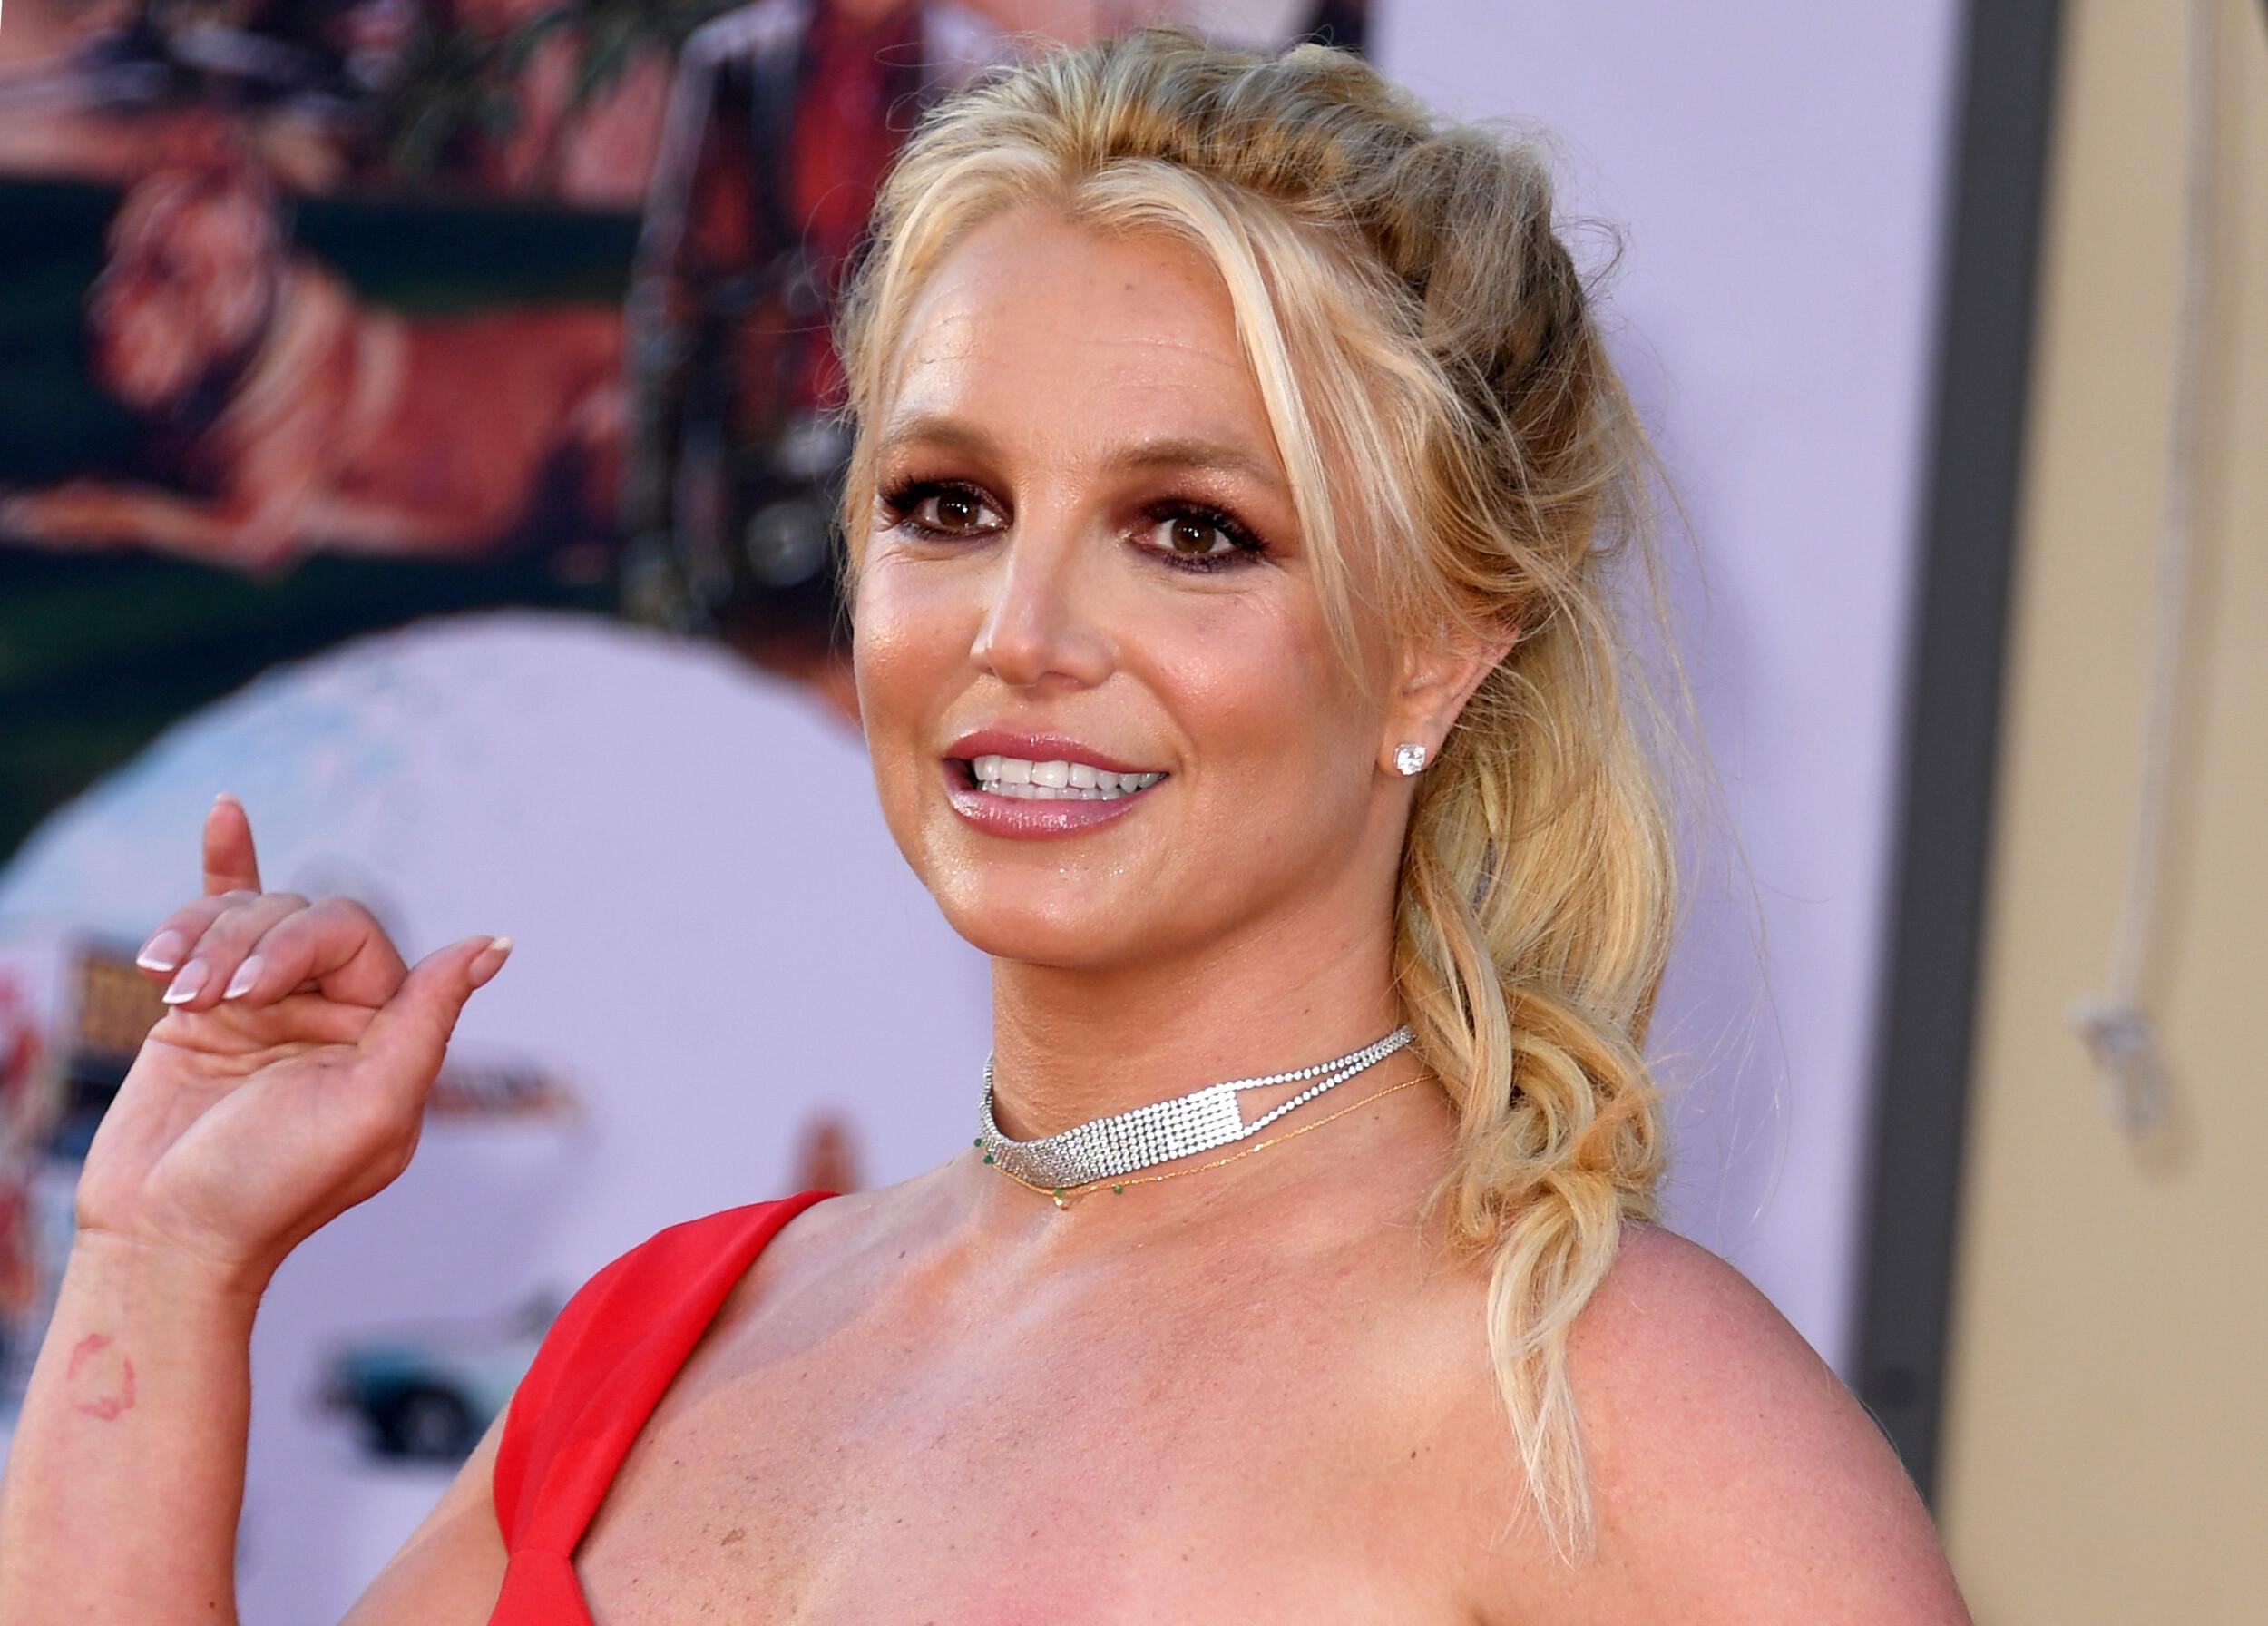 Britney Spears celebrates her sons on social media